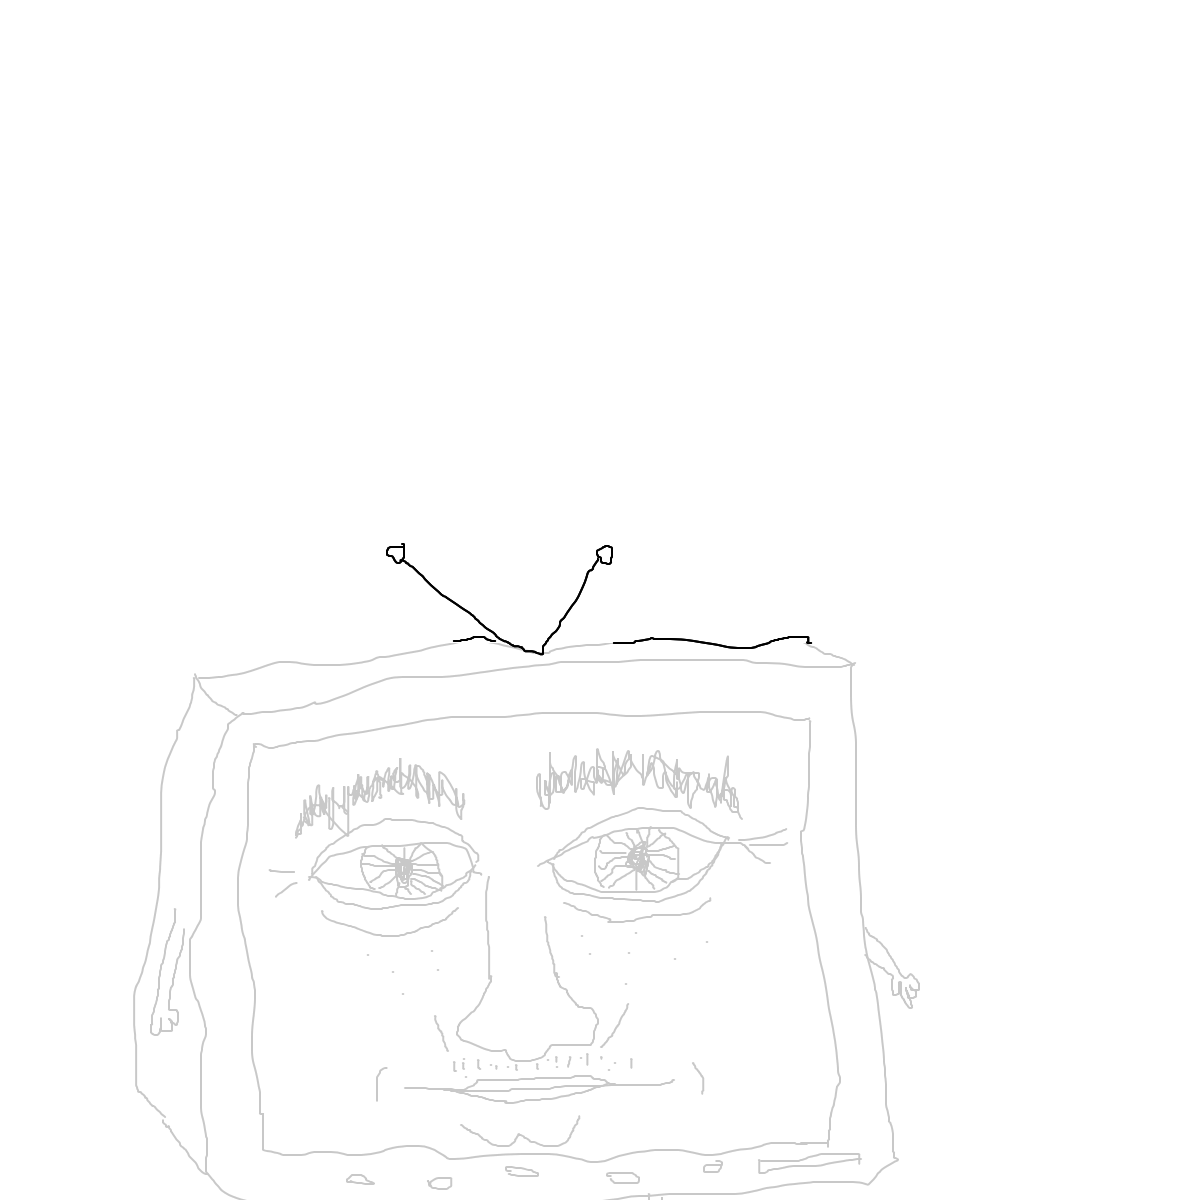 BAAAM drawing#16406 lat:35.8669967651367200lng: -78.6752166748046900